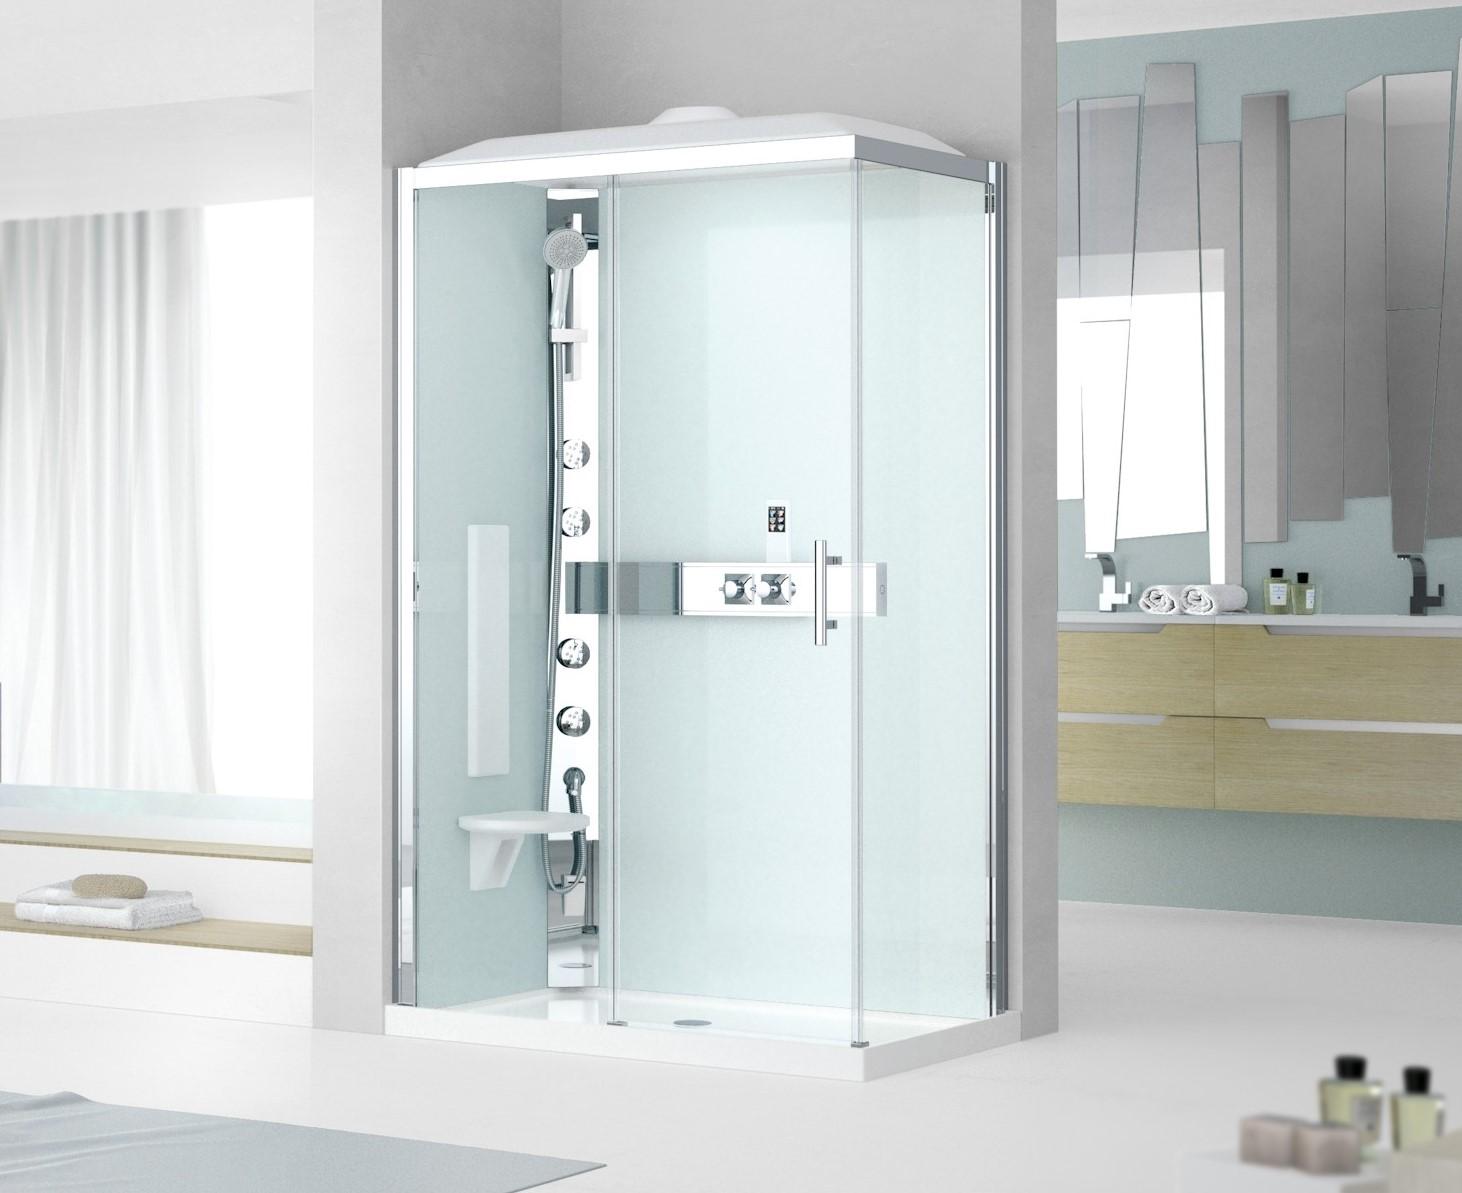 Cabina doccia multifunzione glax 3 hammam - Cabine doccia multifunzione novellini ...